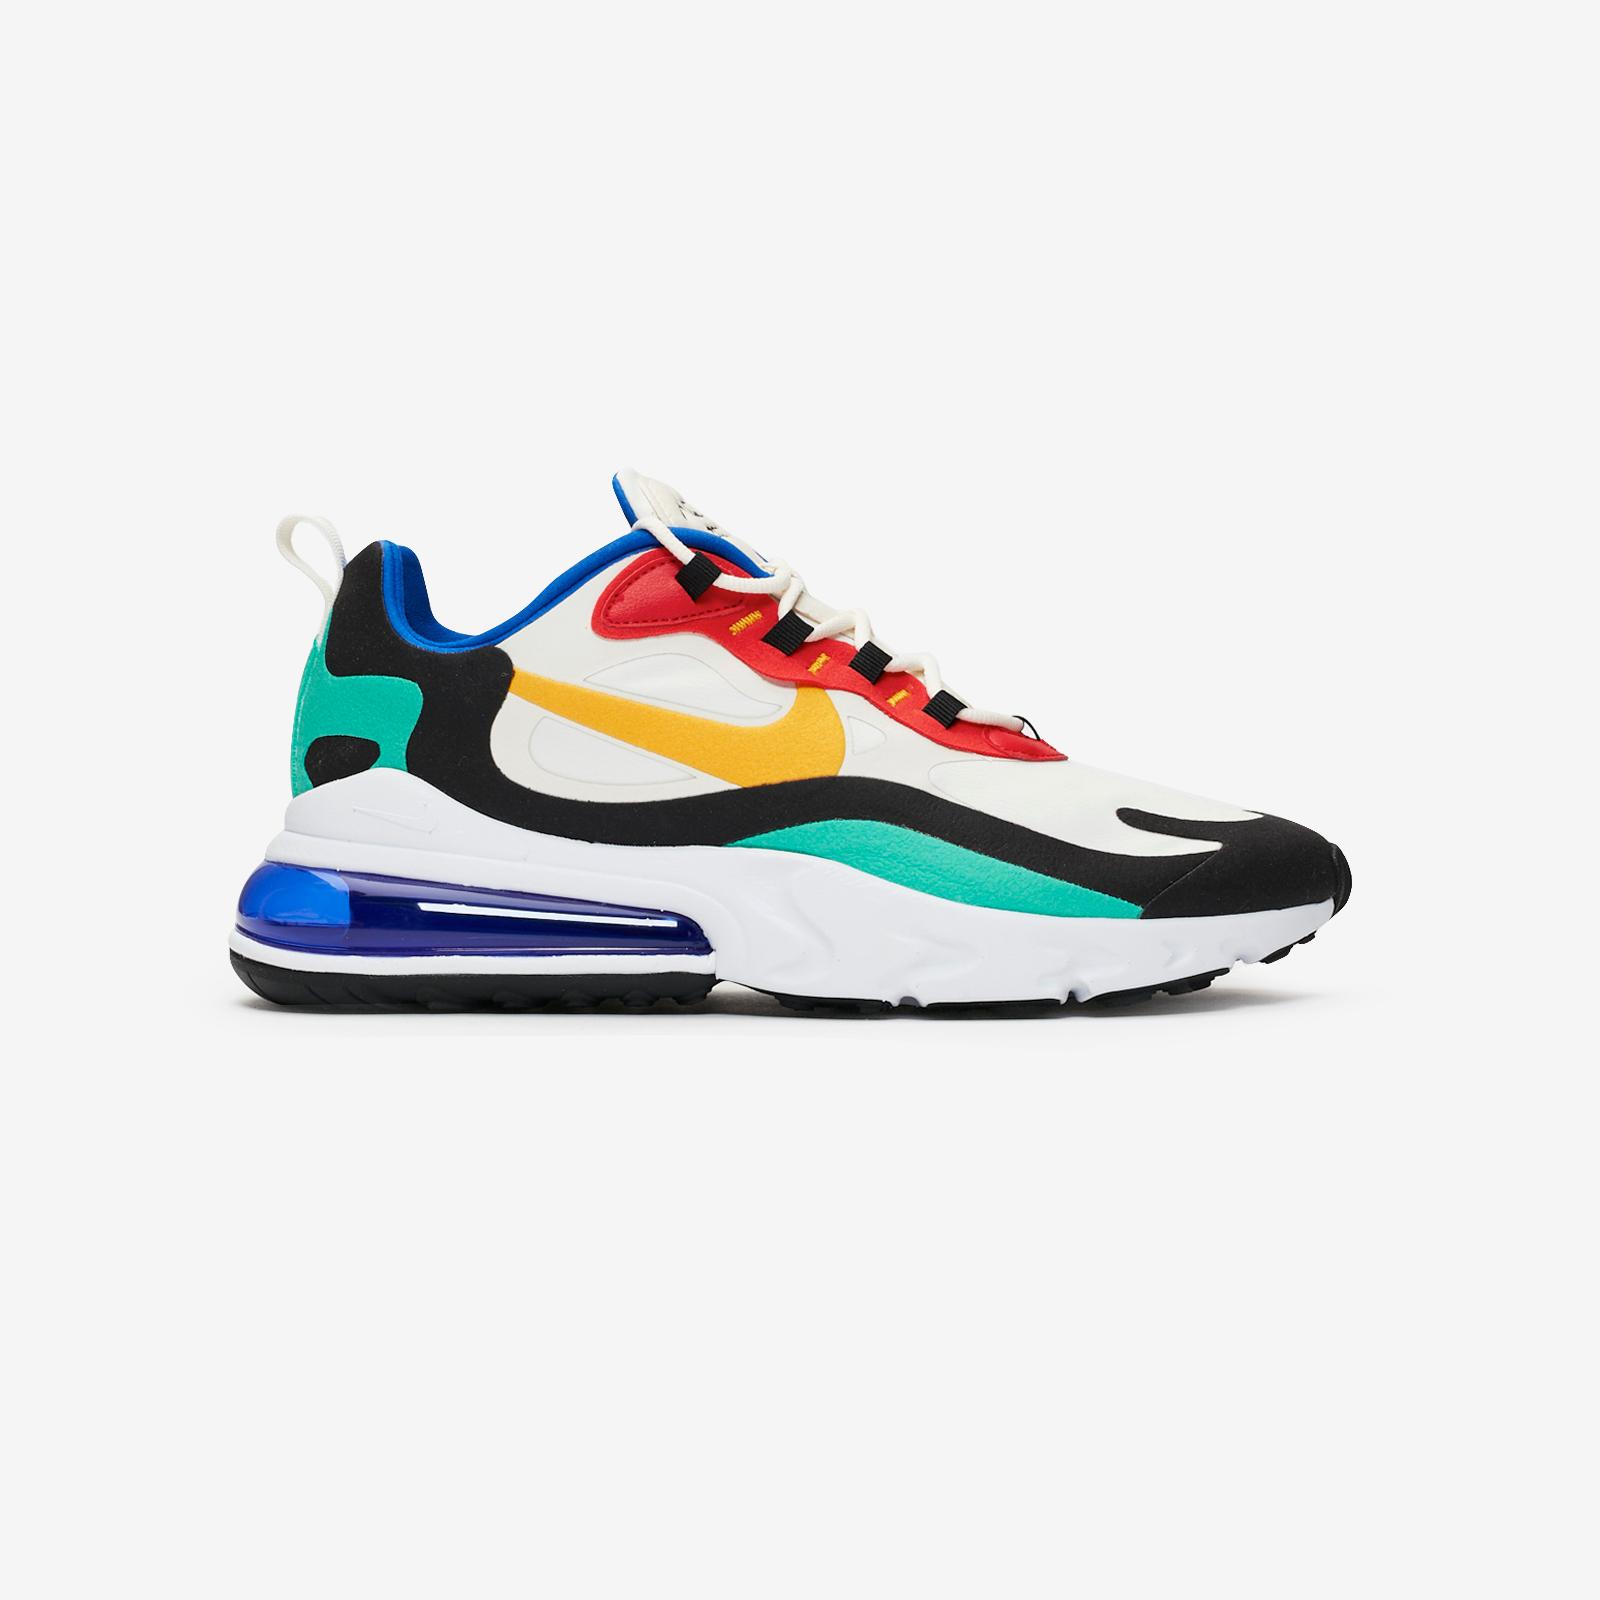 Nike Air Max 270 React Ao4971 002 Sneakersnstuff